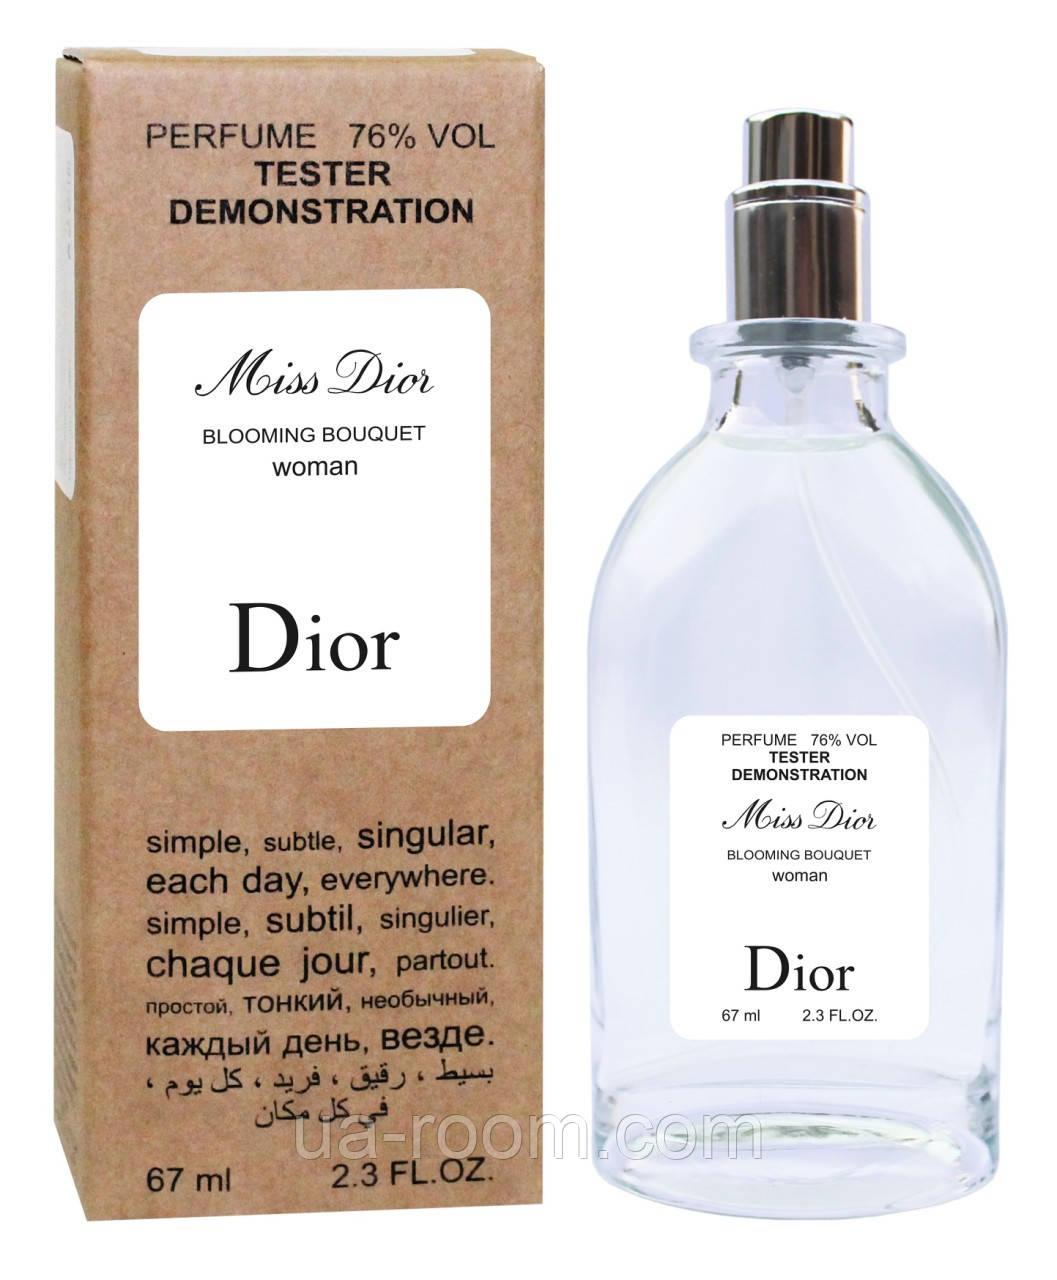 Тестер женский Christian Dior Miss Dior Blooming Bouquet, 67 мл.